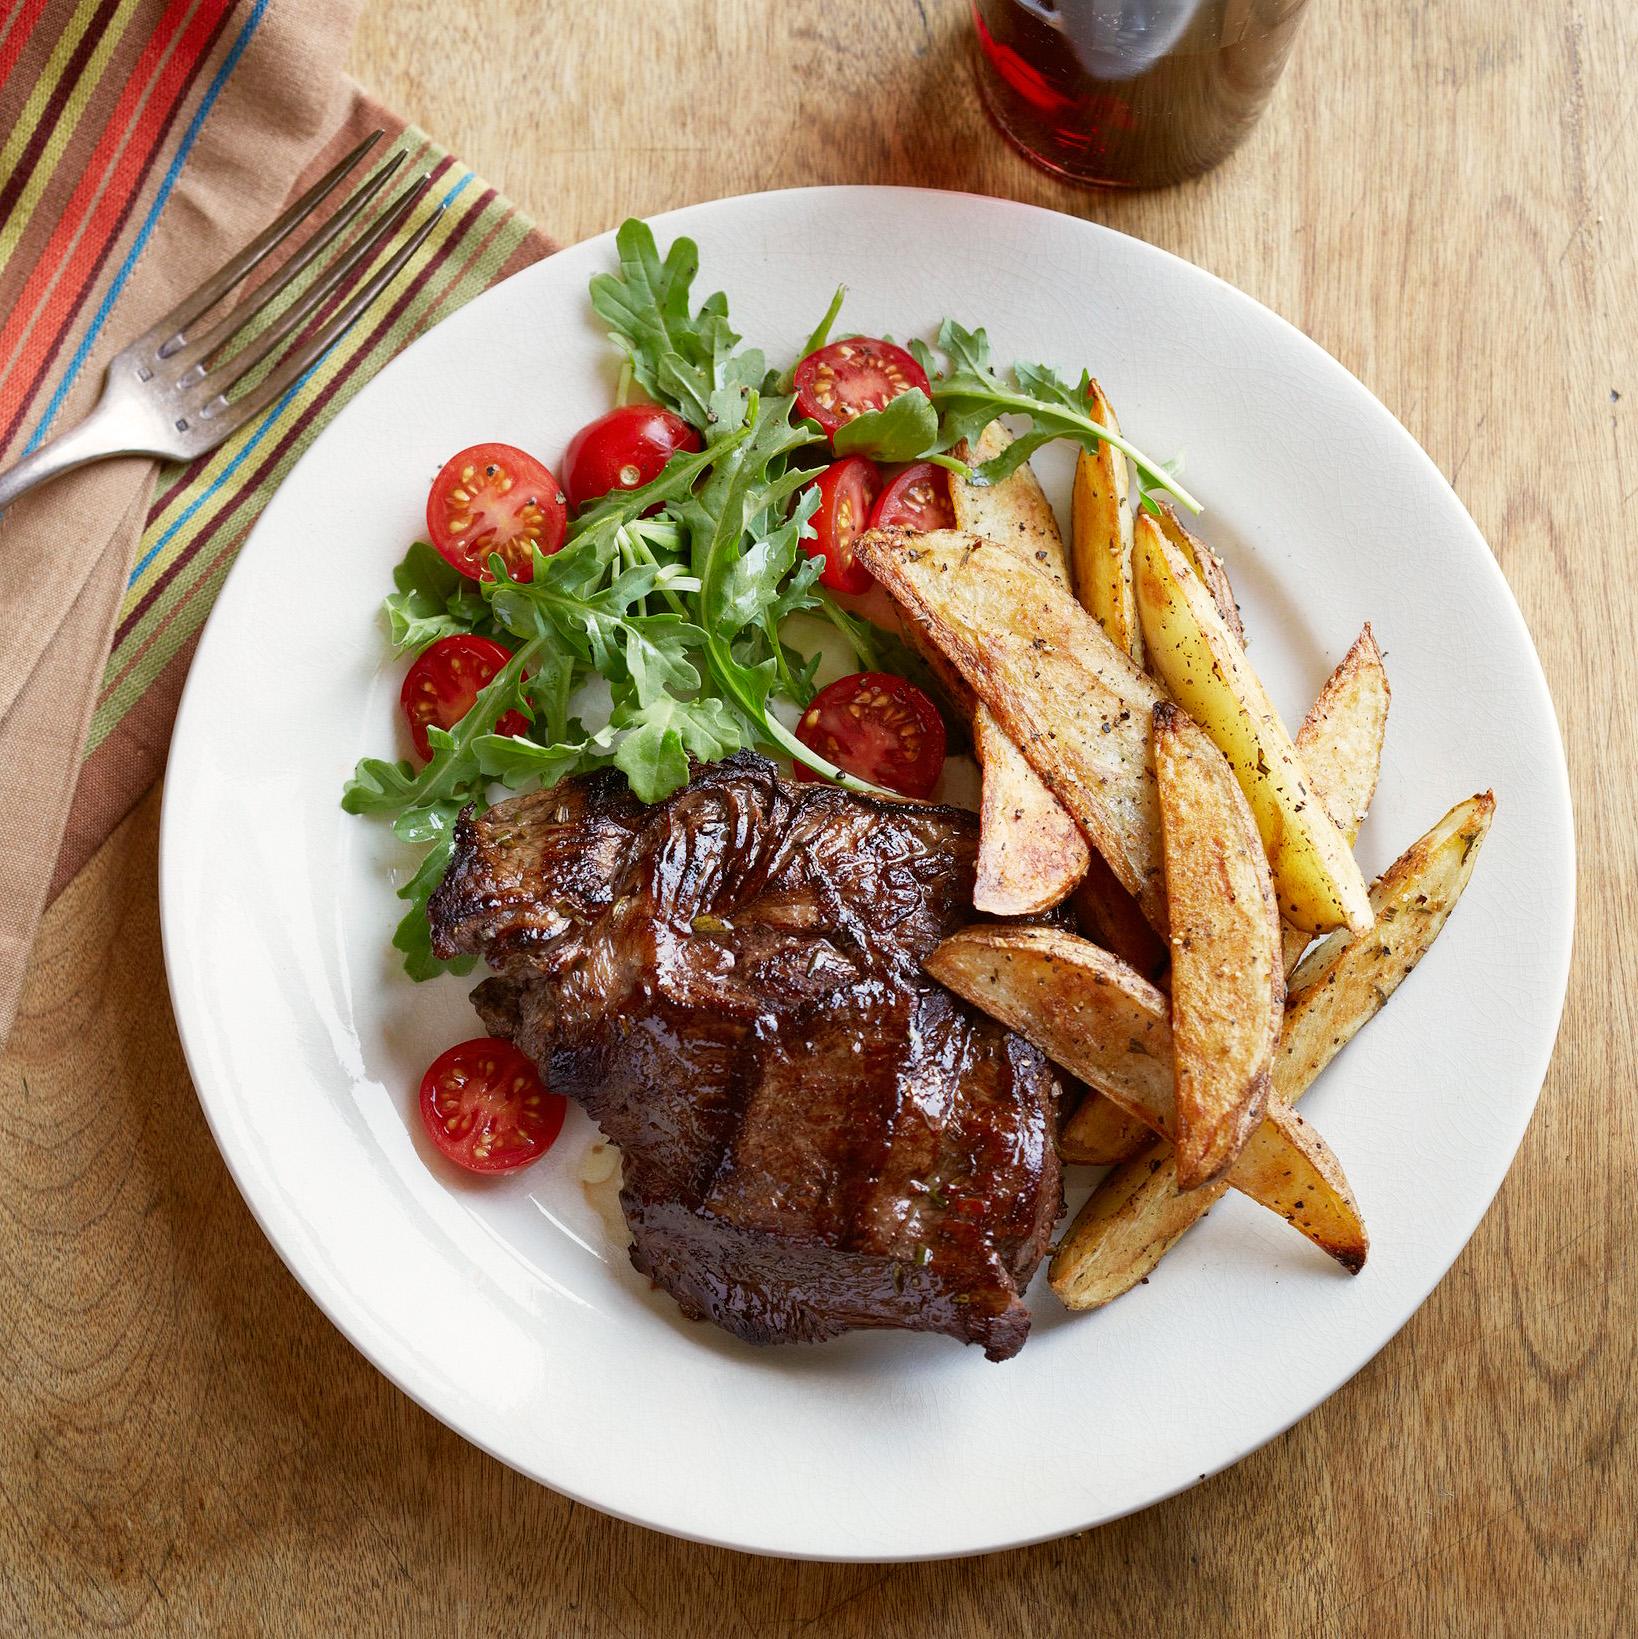 Drunken Steaks with Peppery Oven Fries